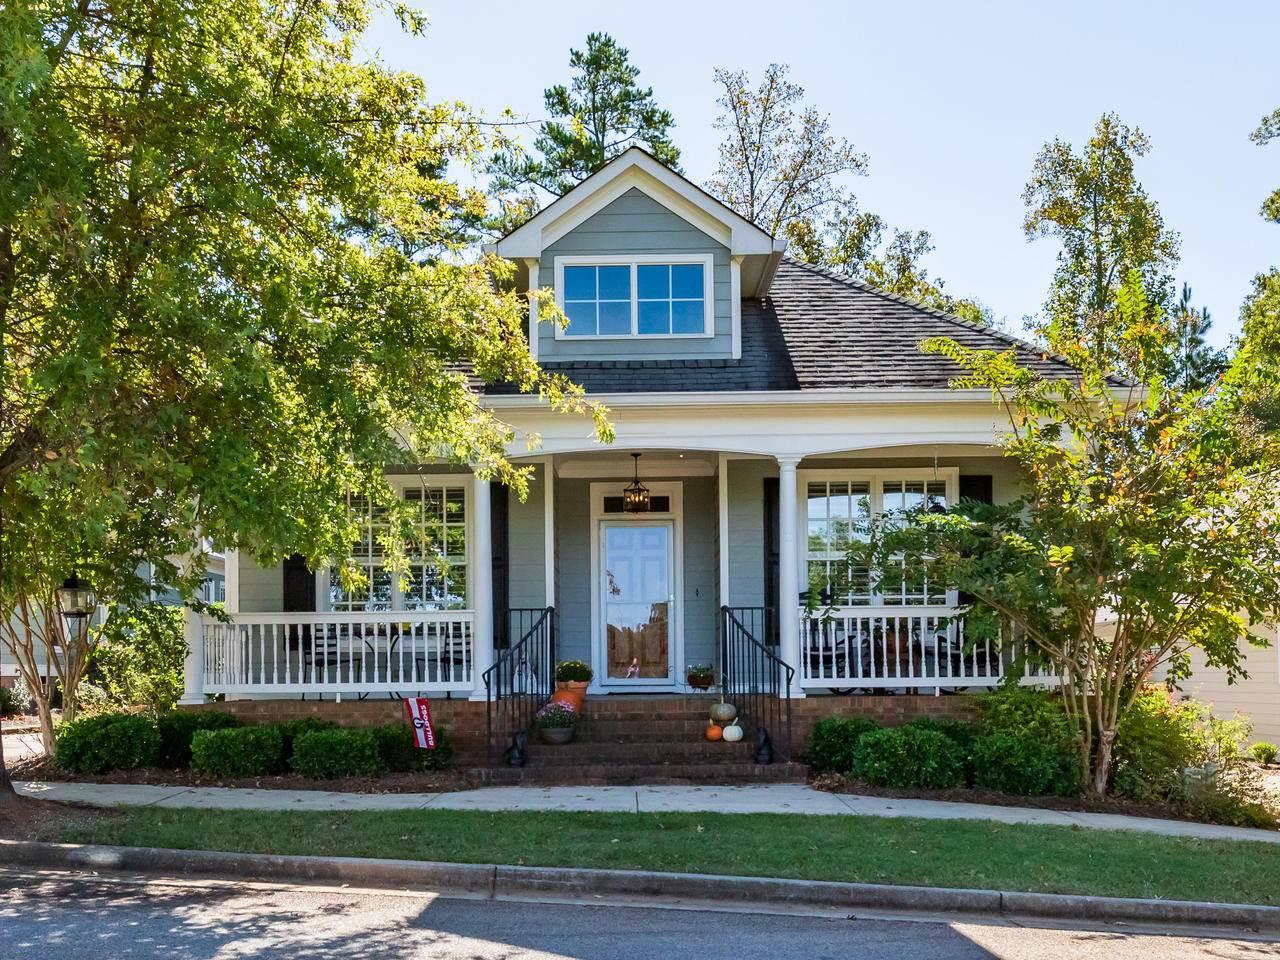 1541 CARRIAGE RIDGE DRIVE, Lake Oconee in Greene County, GA 30642 Home for Sale